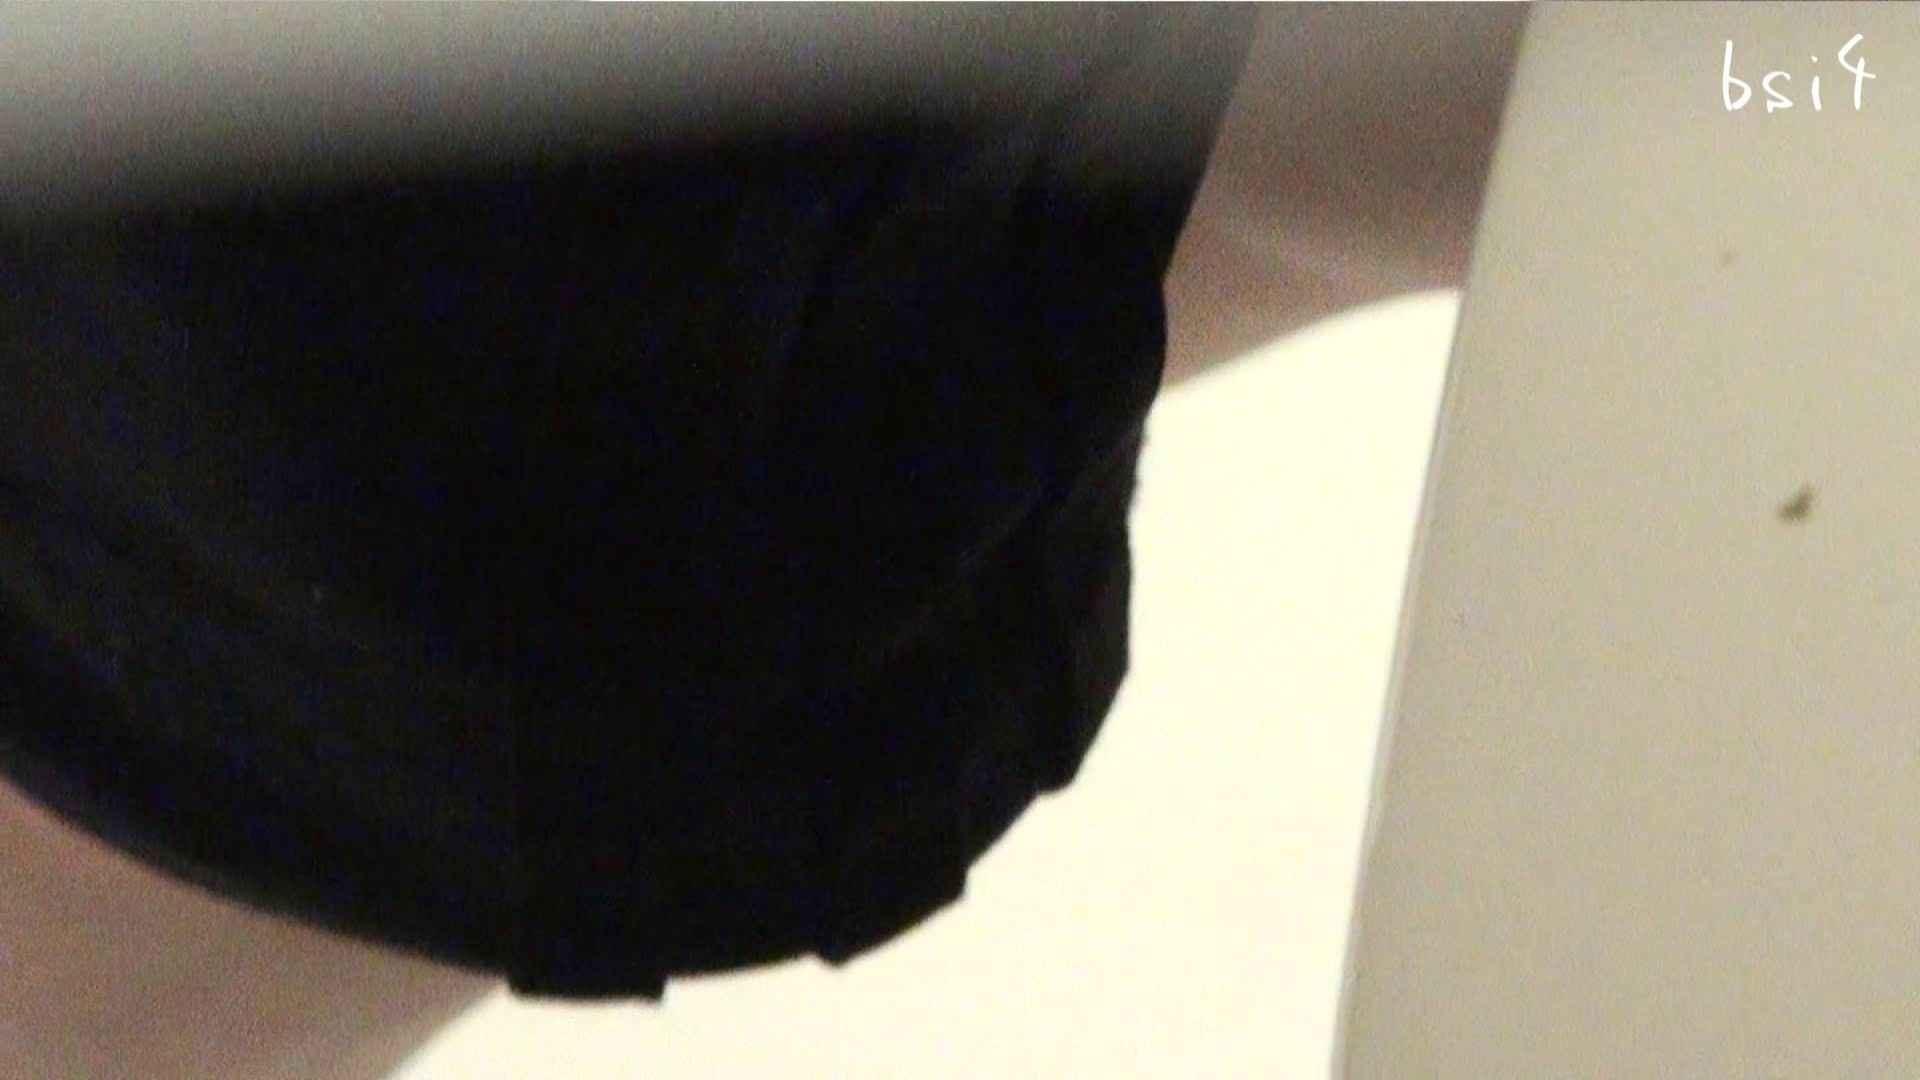 至高下半身盗撮-PREMIUM-【院内病棟編 】 vol.04 盗撮 | ナース  55画像 11